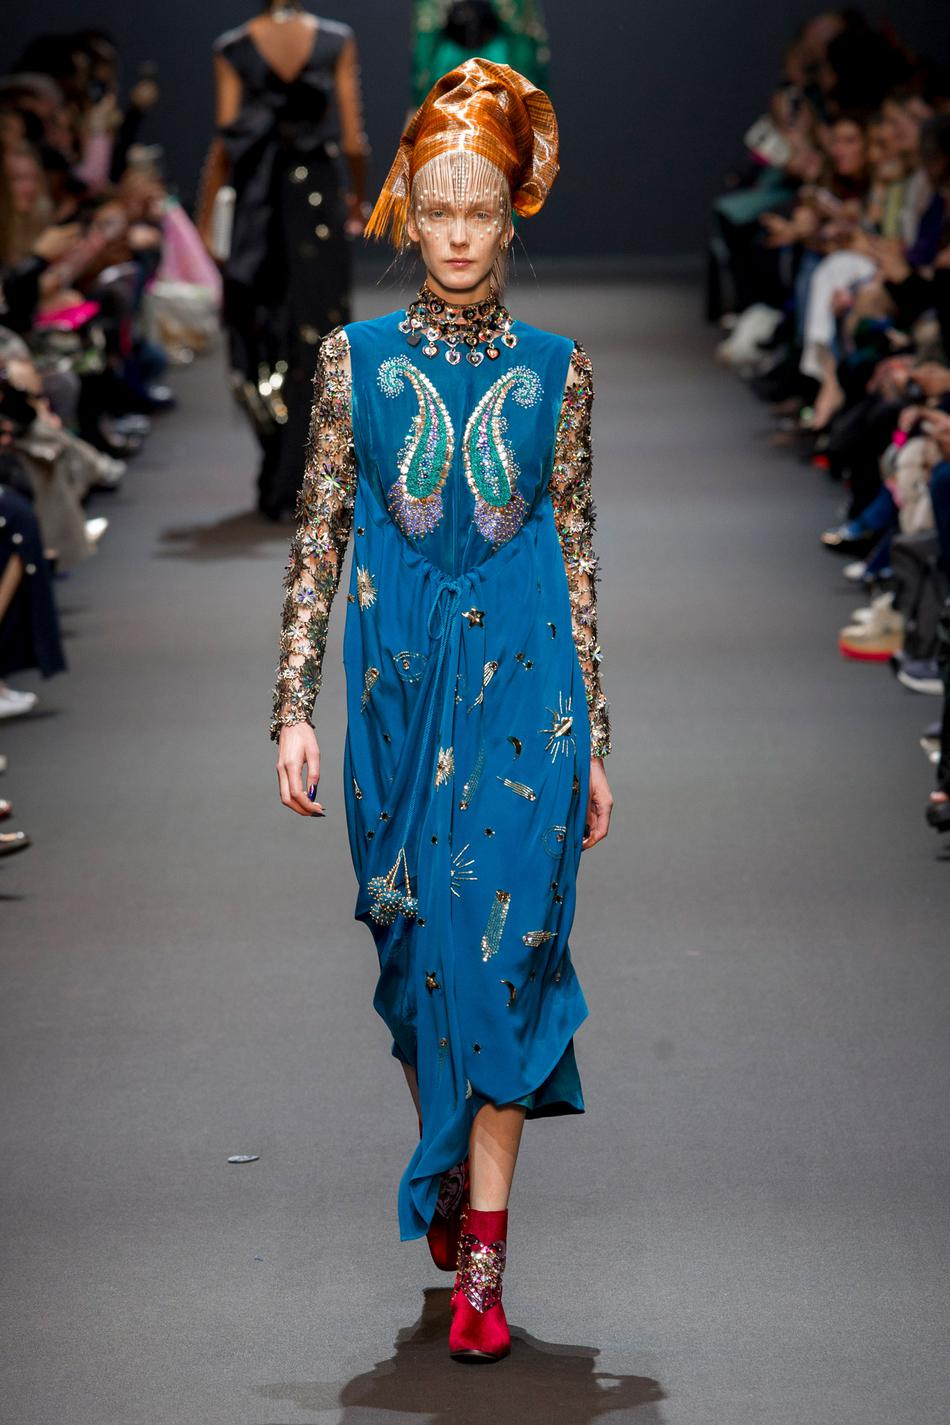 Défilé Manish Arora Fashion Week 2017 - Look 32